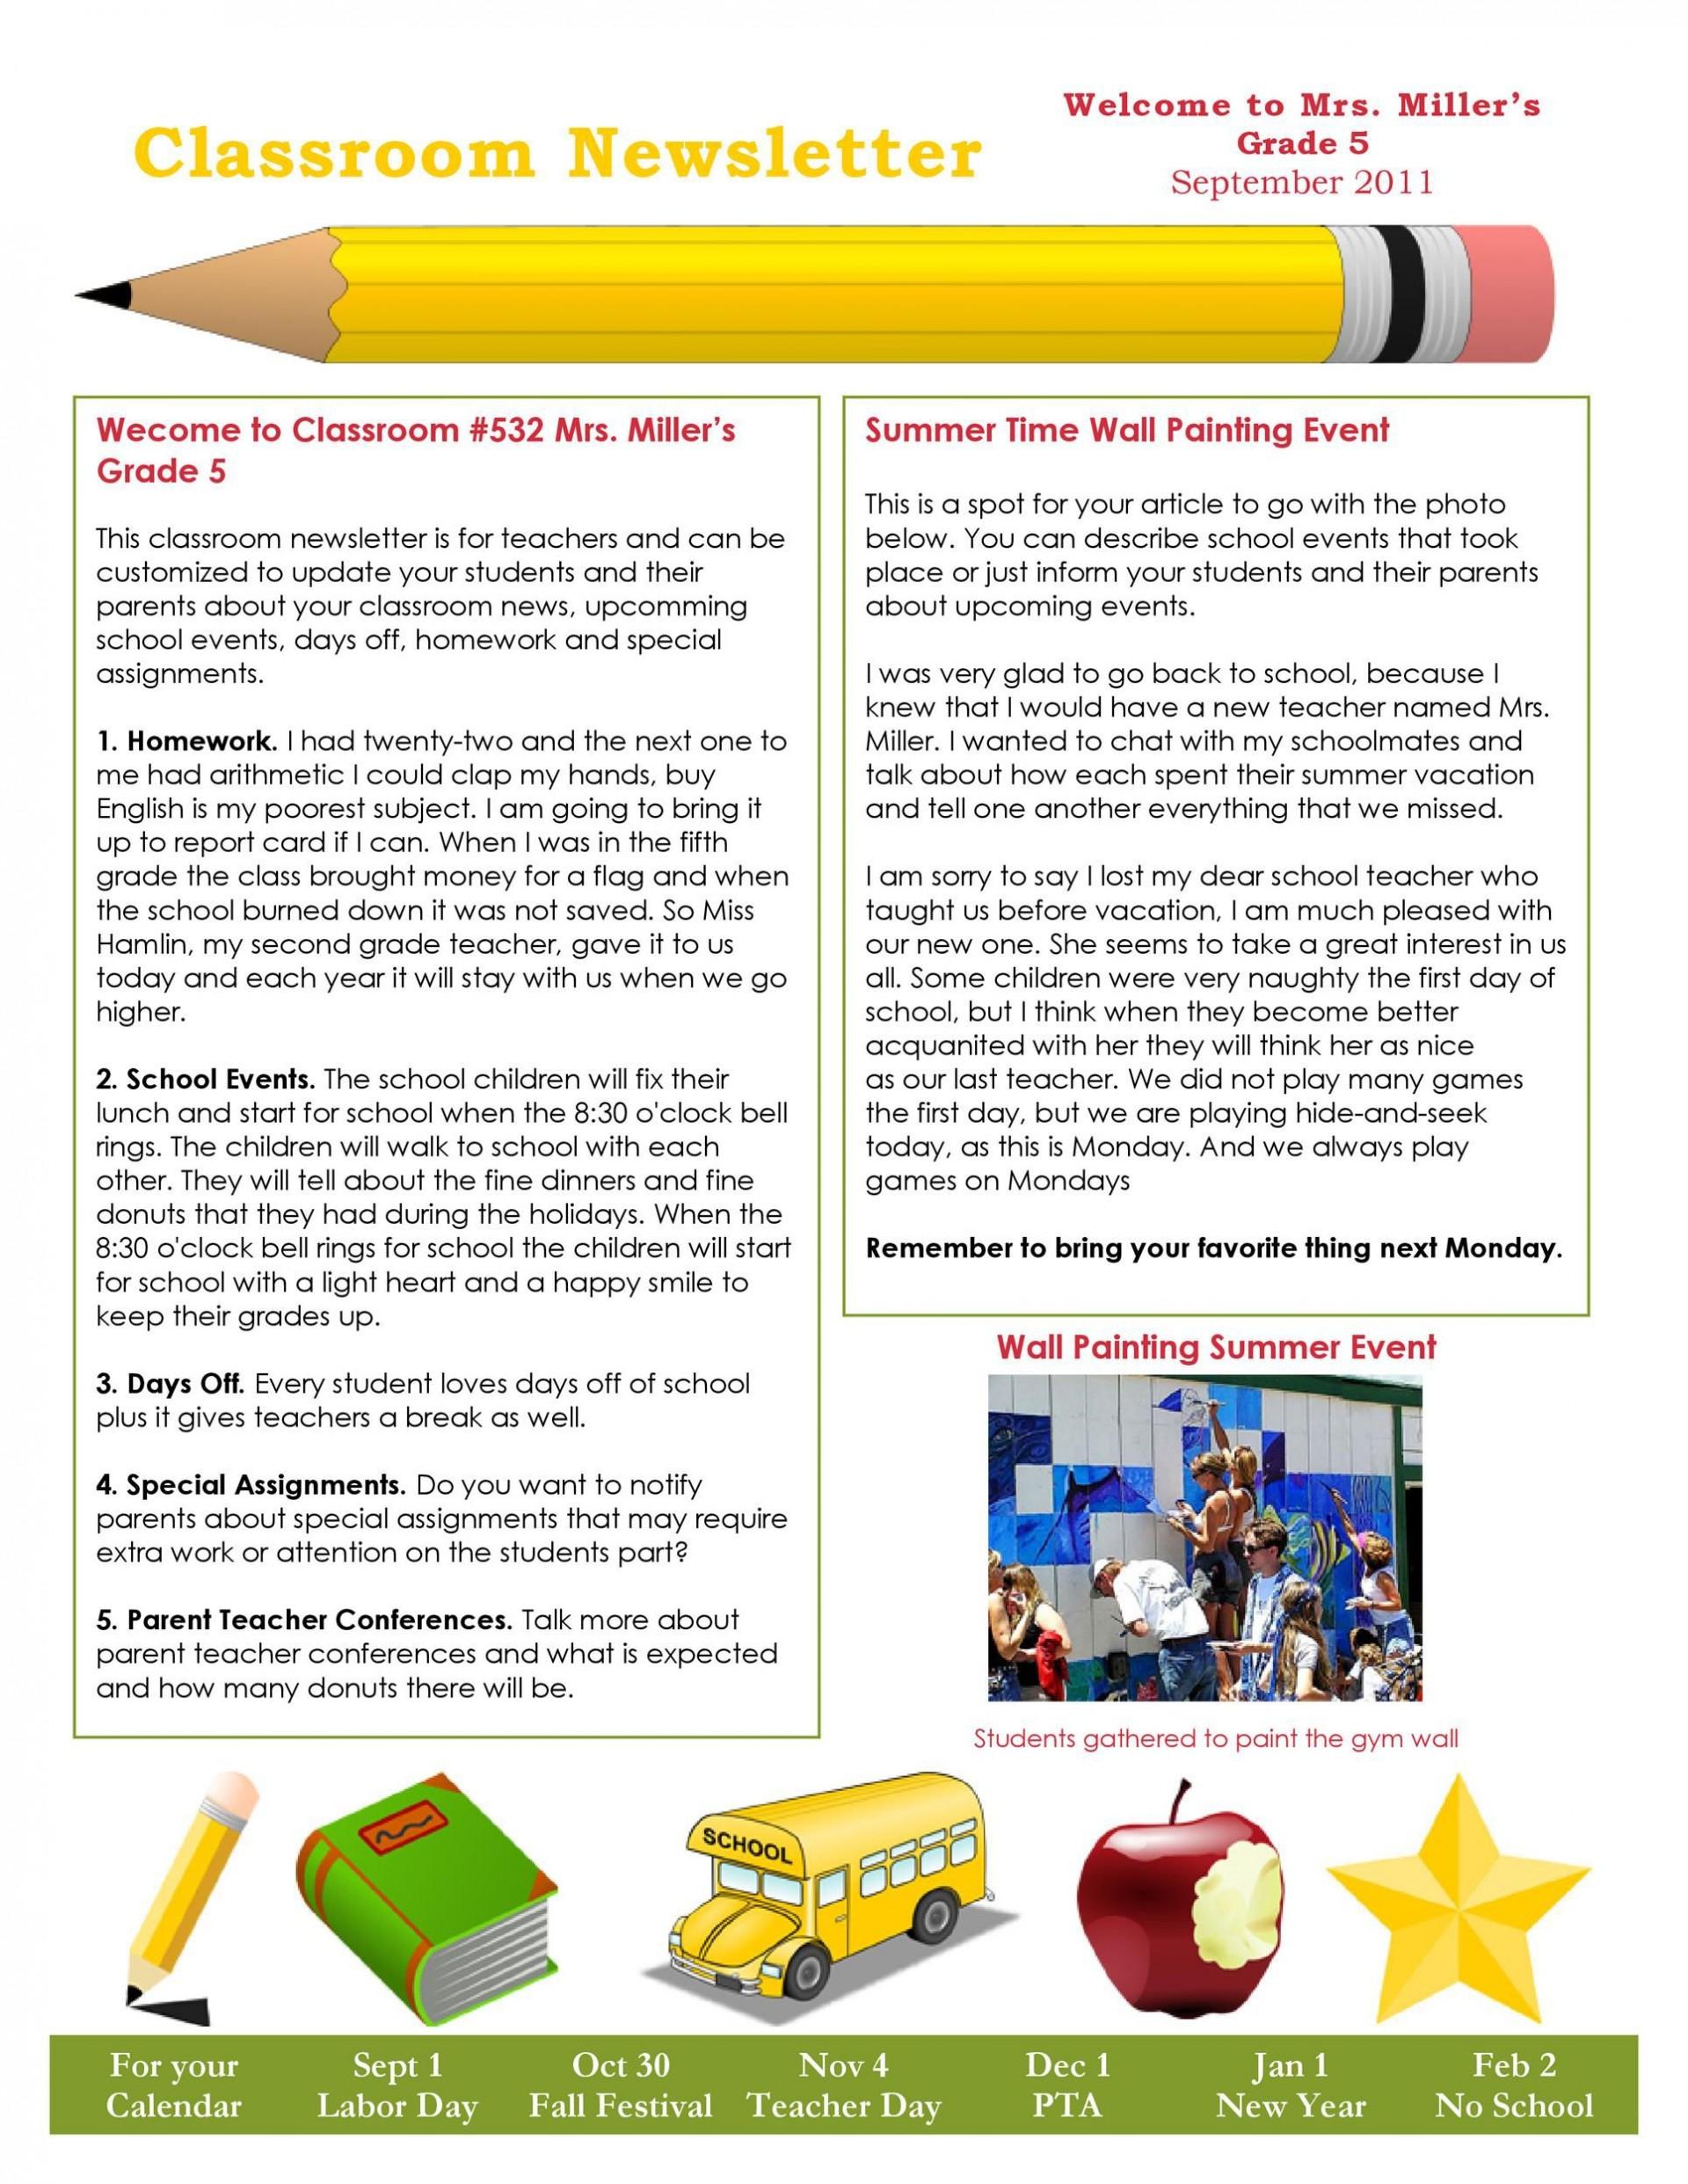 008 Top Elementary School Newsletter Template Concept  Clas Teacher Free Counselor1920